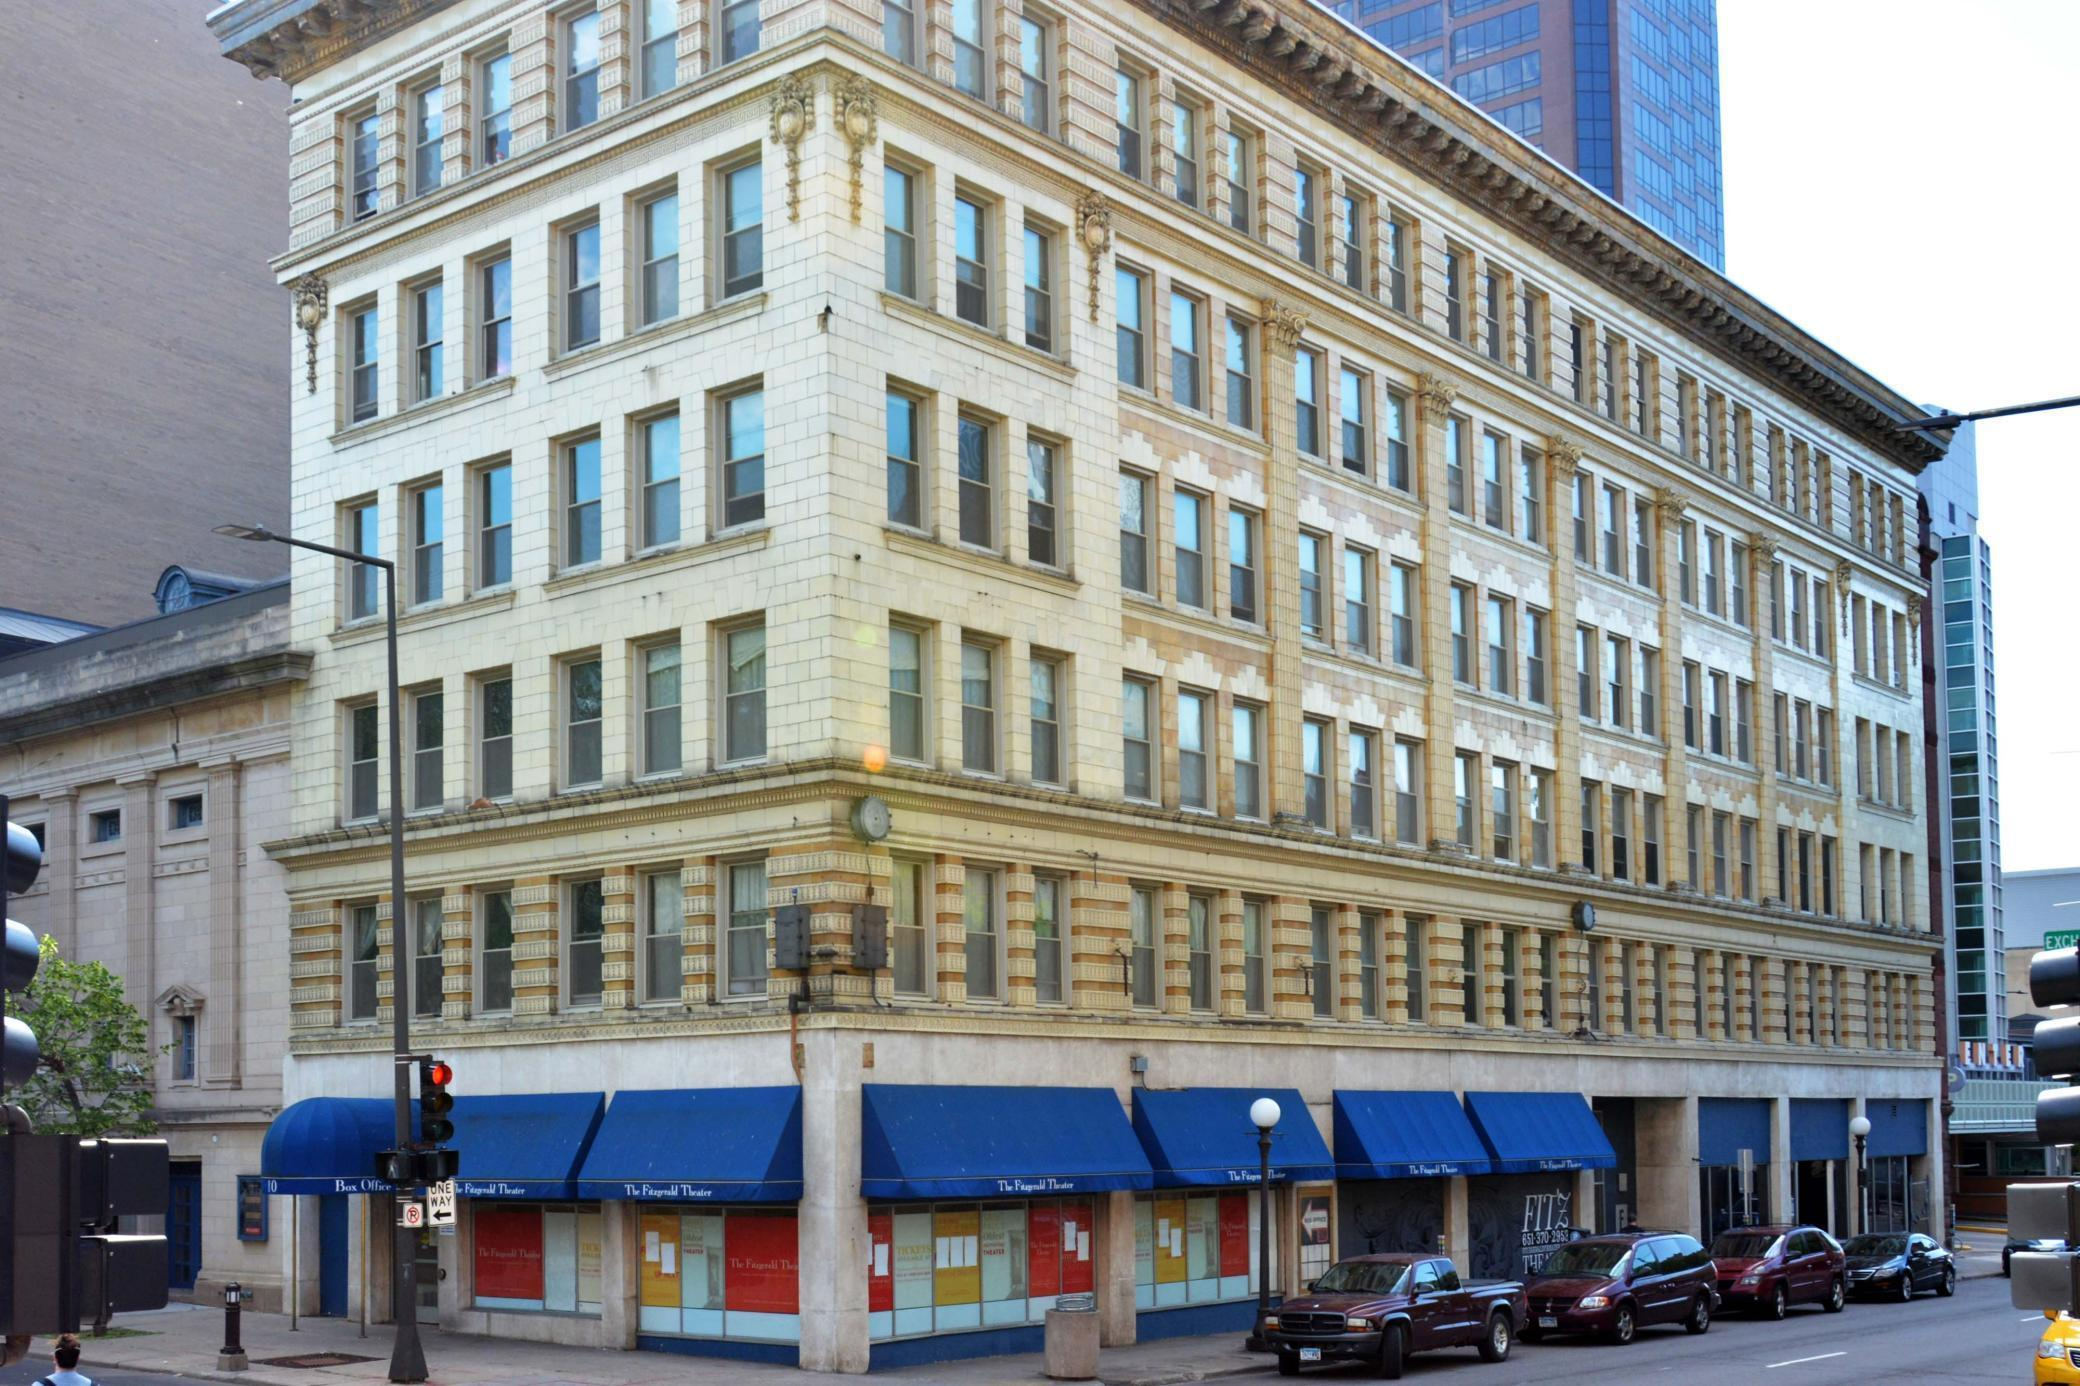 488 Wabasha Street, Saint Paul, Minnesota 55102, 1 Bedroom Bedrooms, ,1 BathroomBathrooms,Residential,For Sale,Wabasha,NST5729052